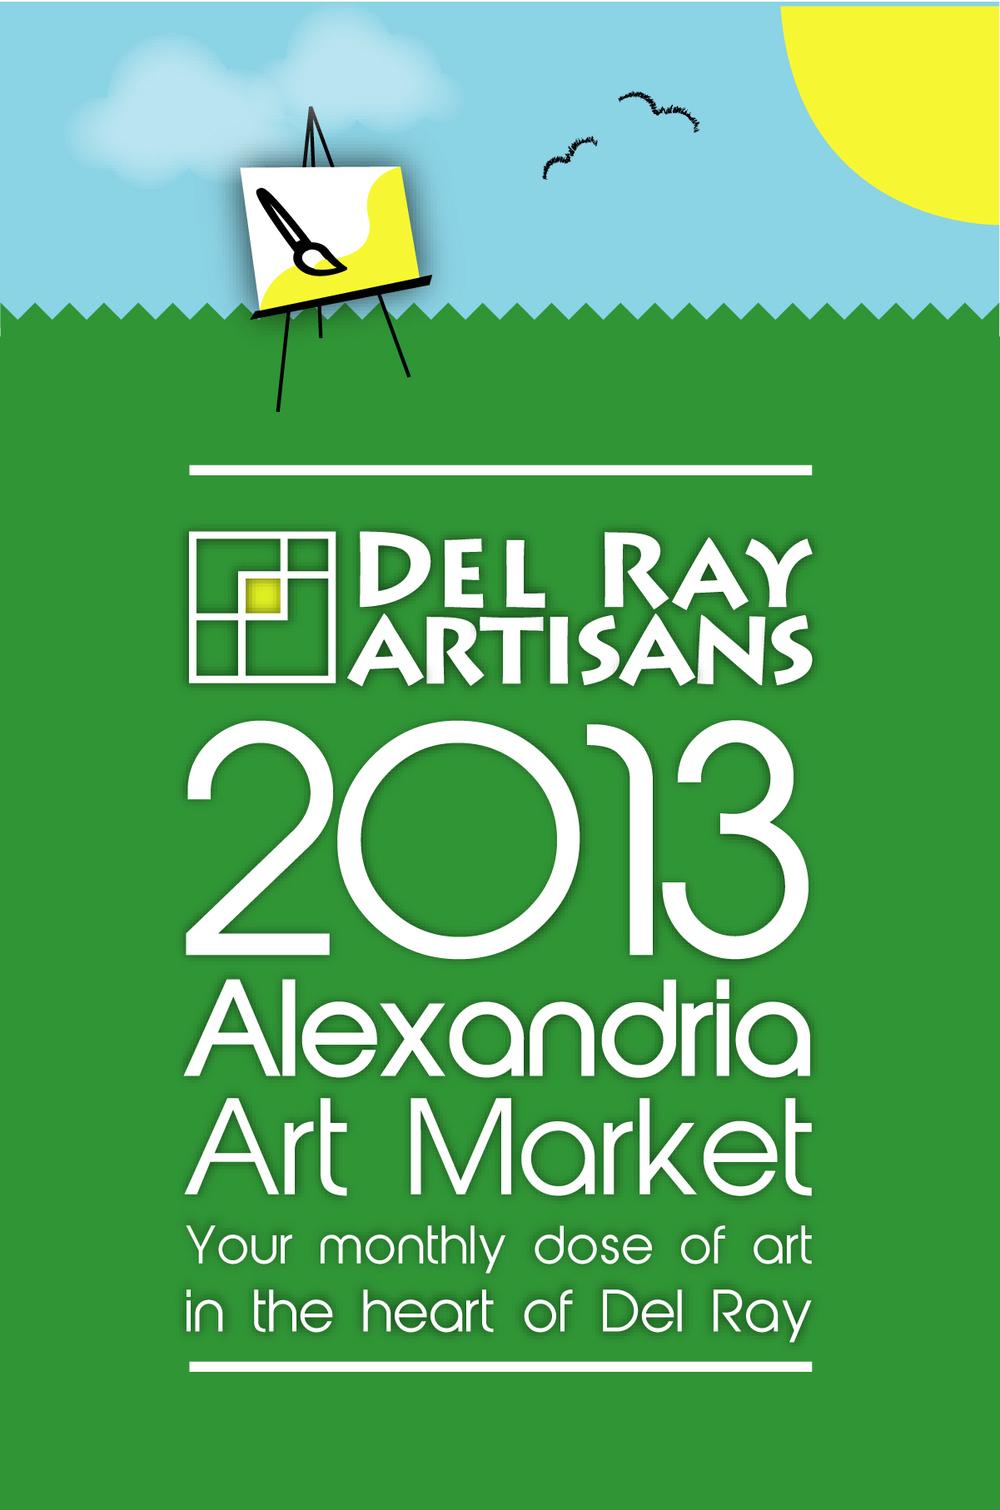 grand opening of alexandria art market wirealm by tamara